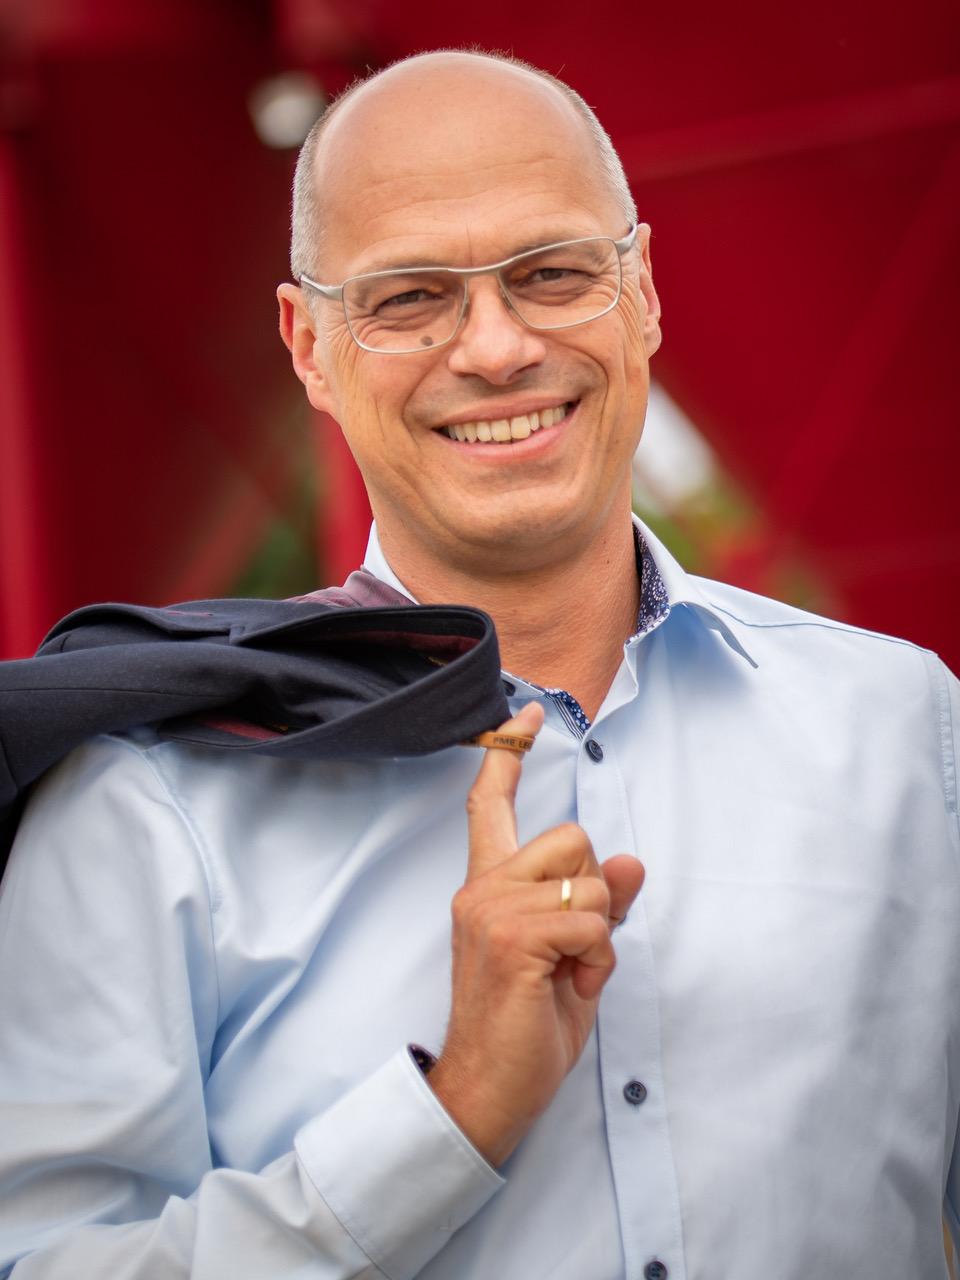 Bürgermeister Wilfried Brüning